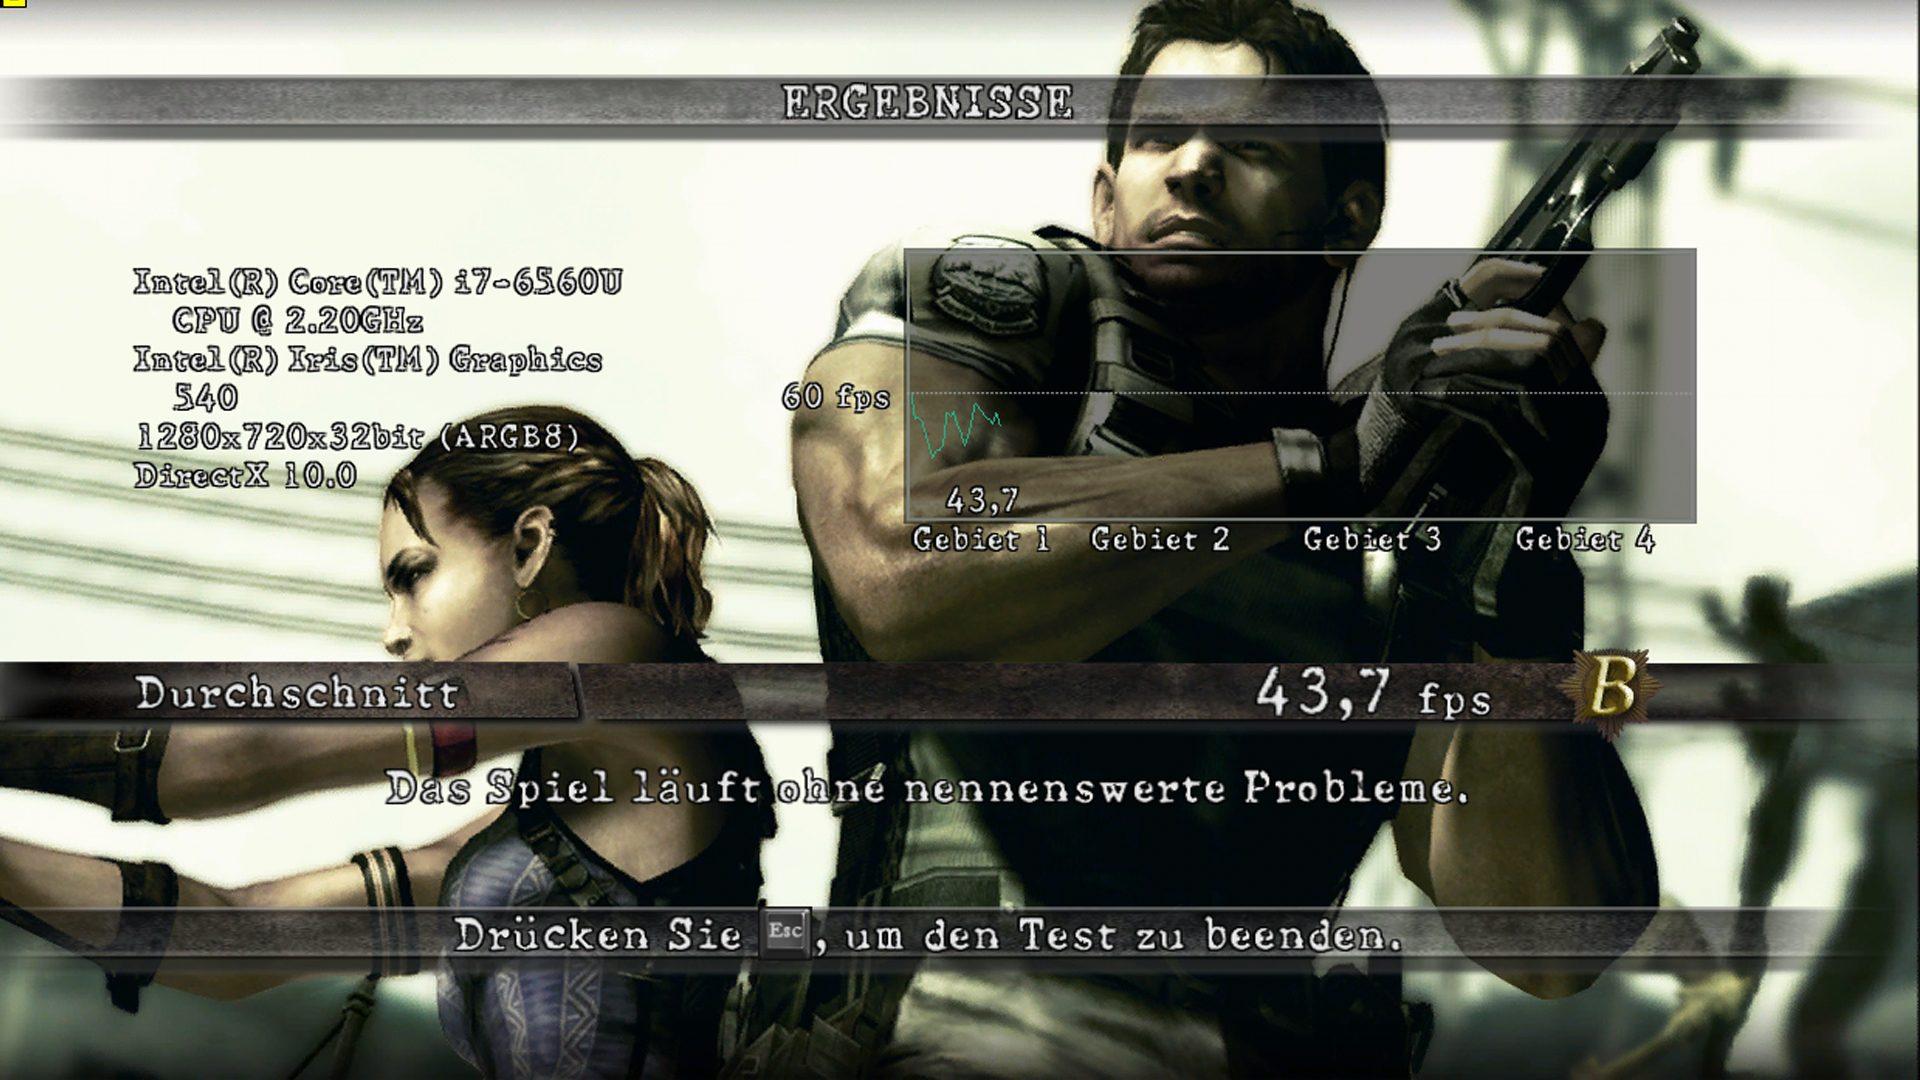 HP-Spectre-x360-OLED-13-4203ng-Grafik_3